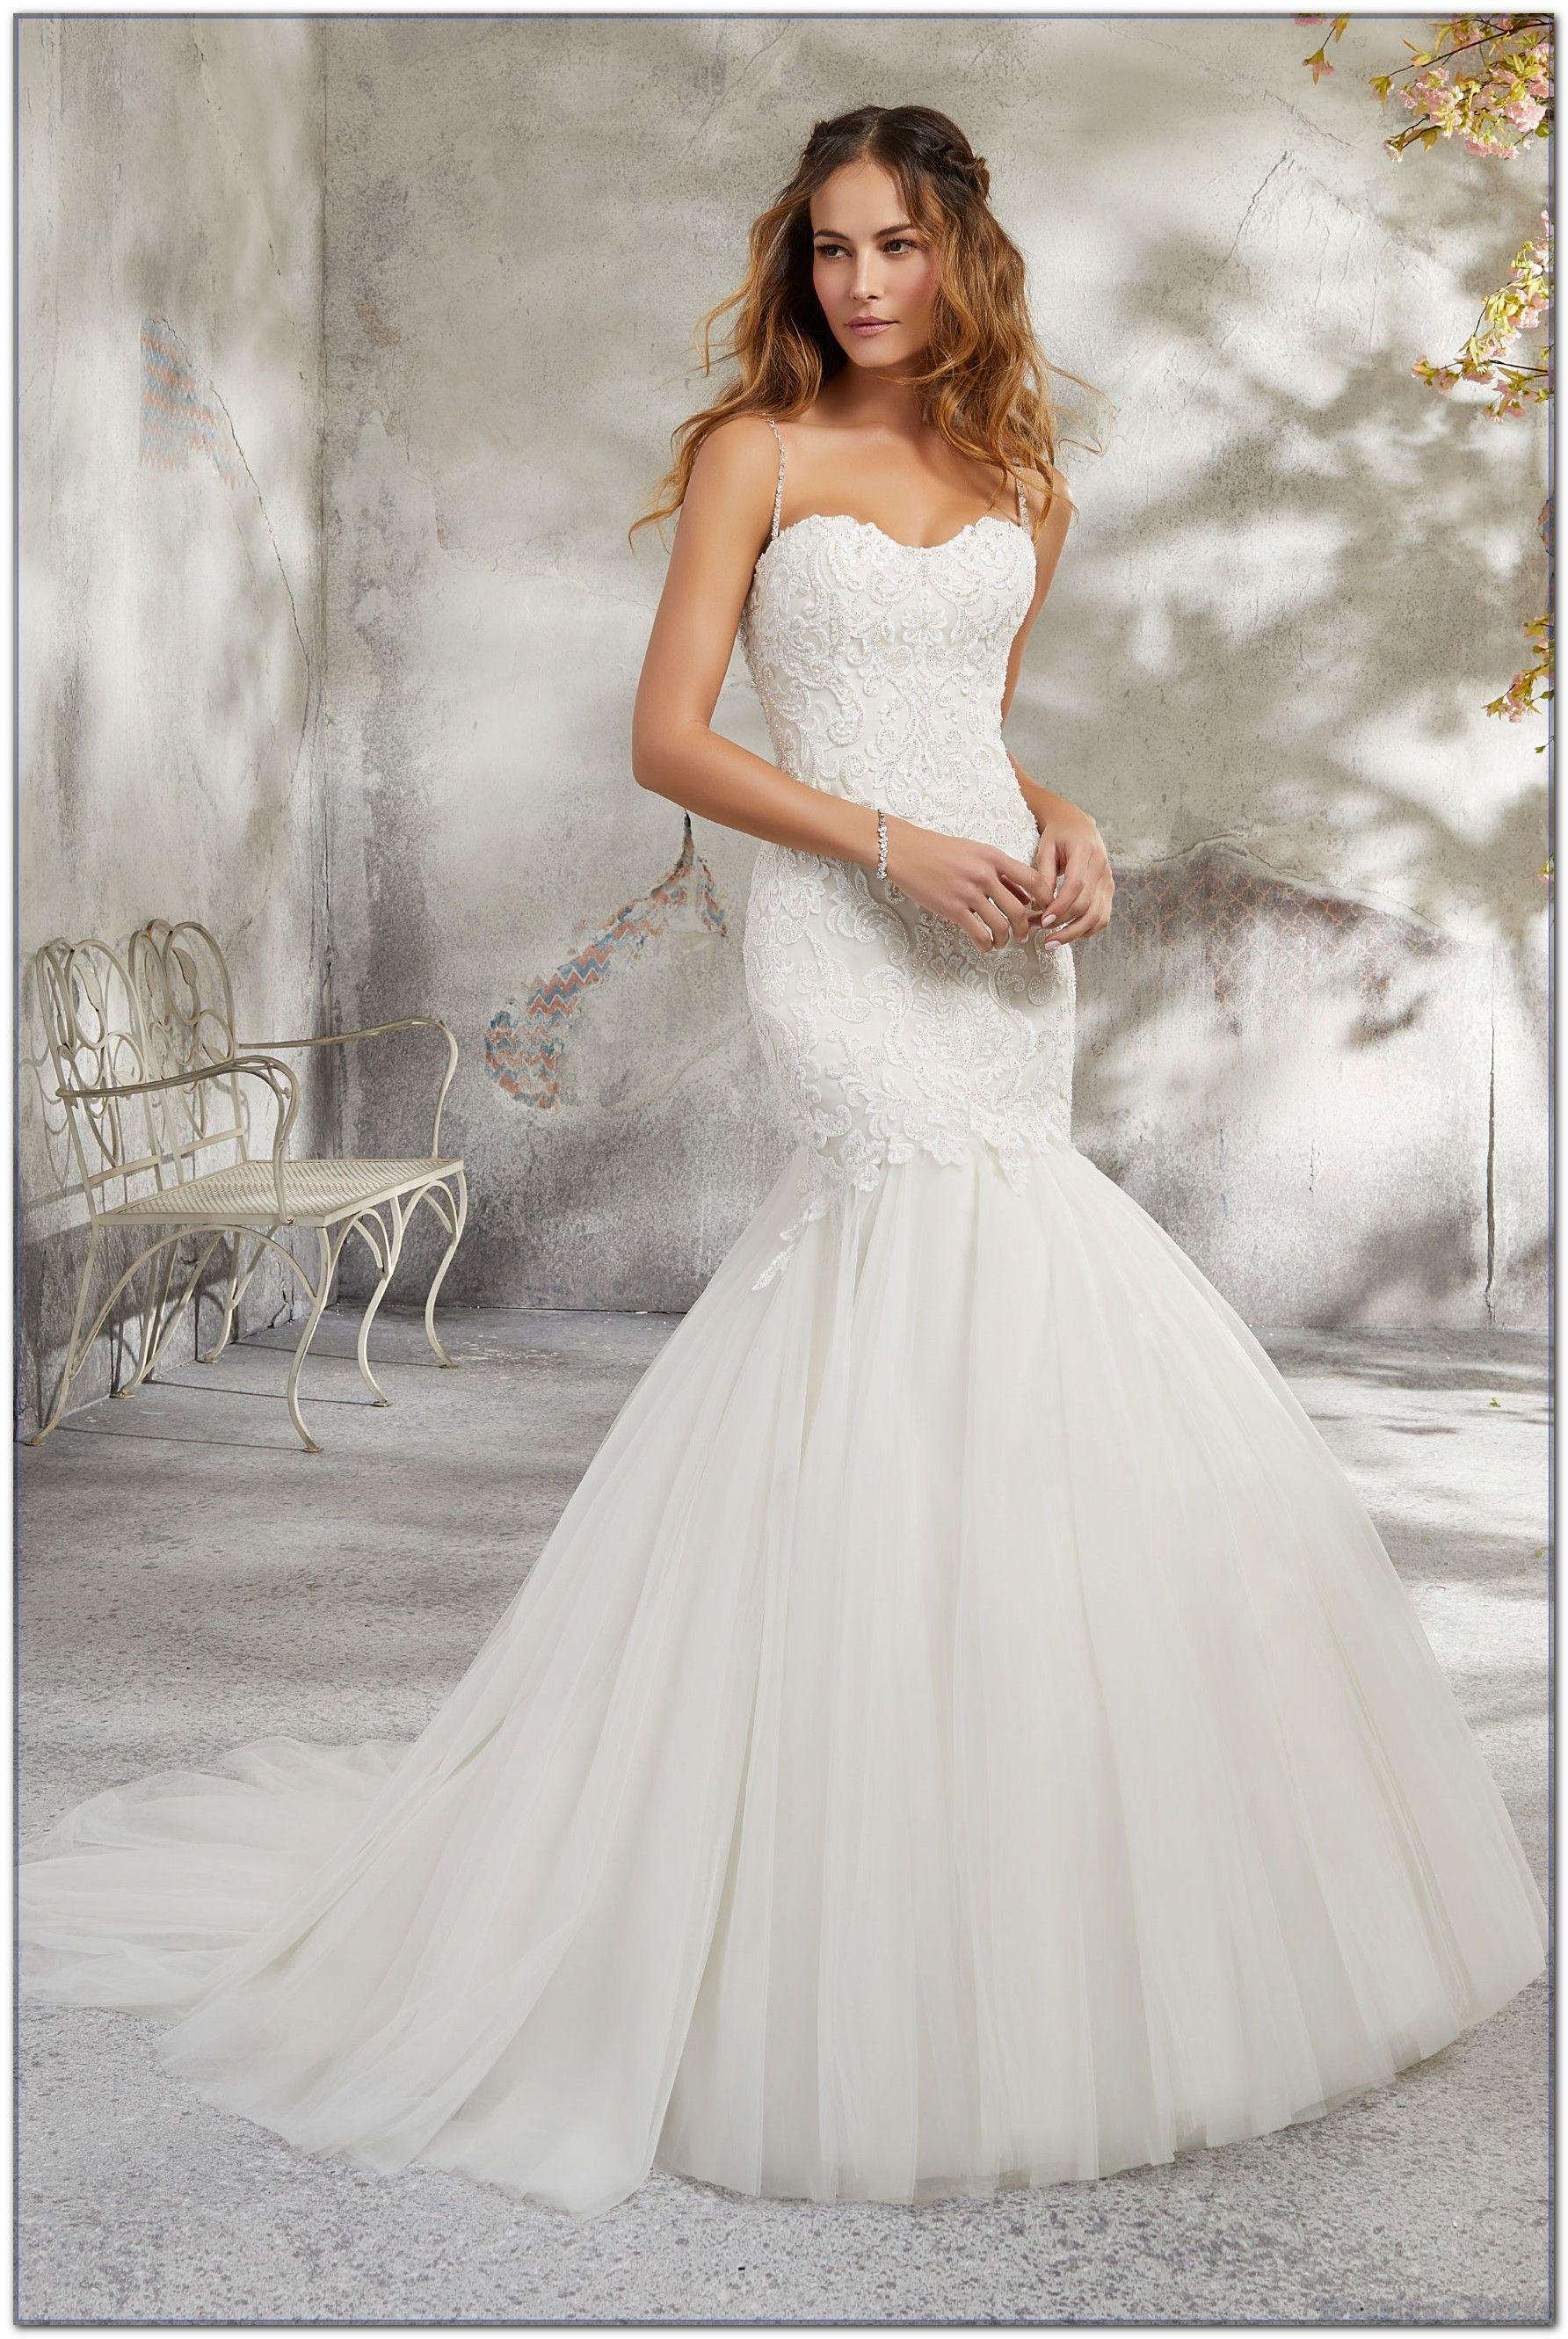 27 Ways To Improve Weddings Dress